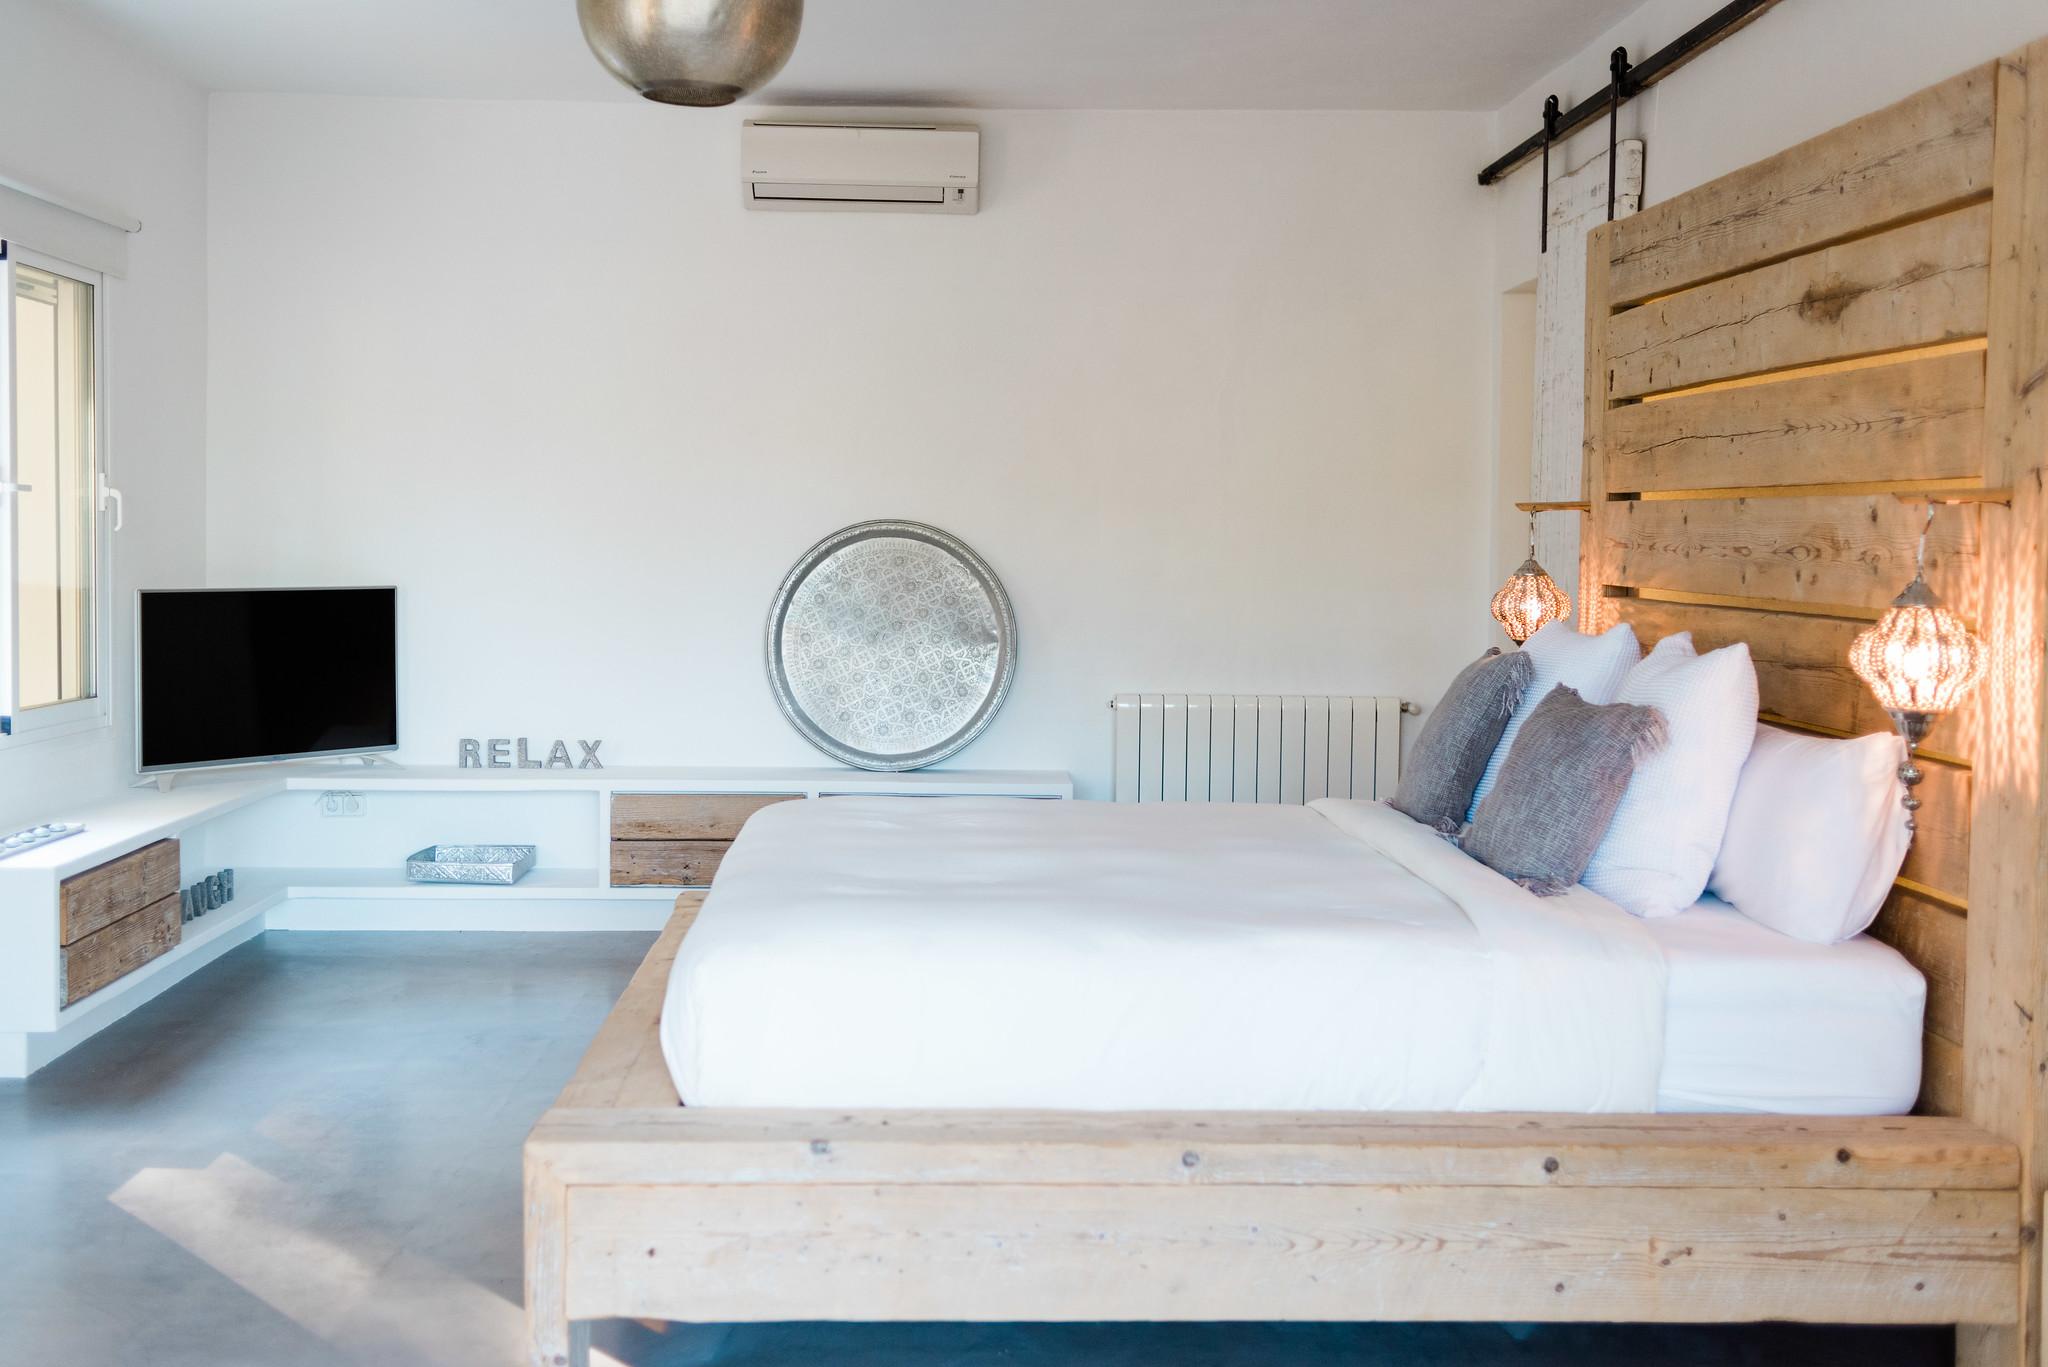 https://www.white-ibiza.com/wp-content/uploads/2020/05/white-ibiza-villas-can-verde-interior-master.jpg